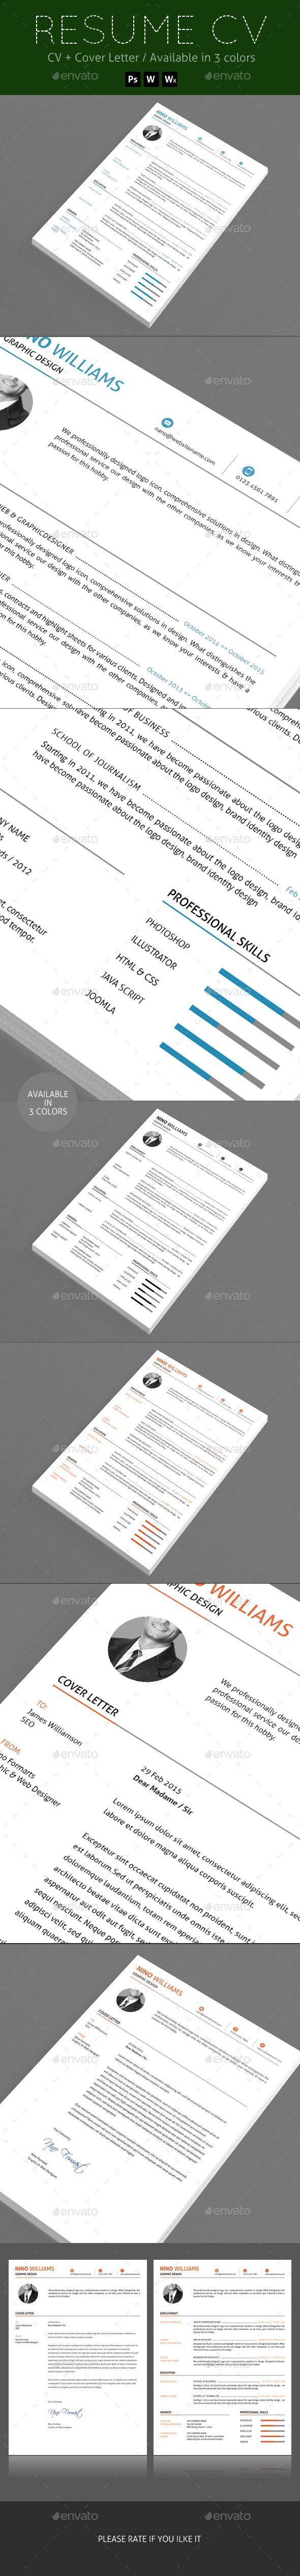 Pin de best Graphic Design en Resume Templates | Pinterest | Curriculums